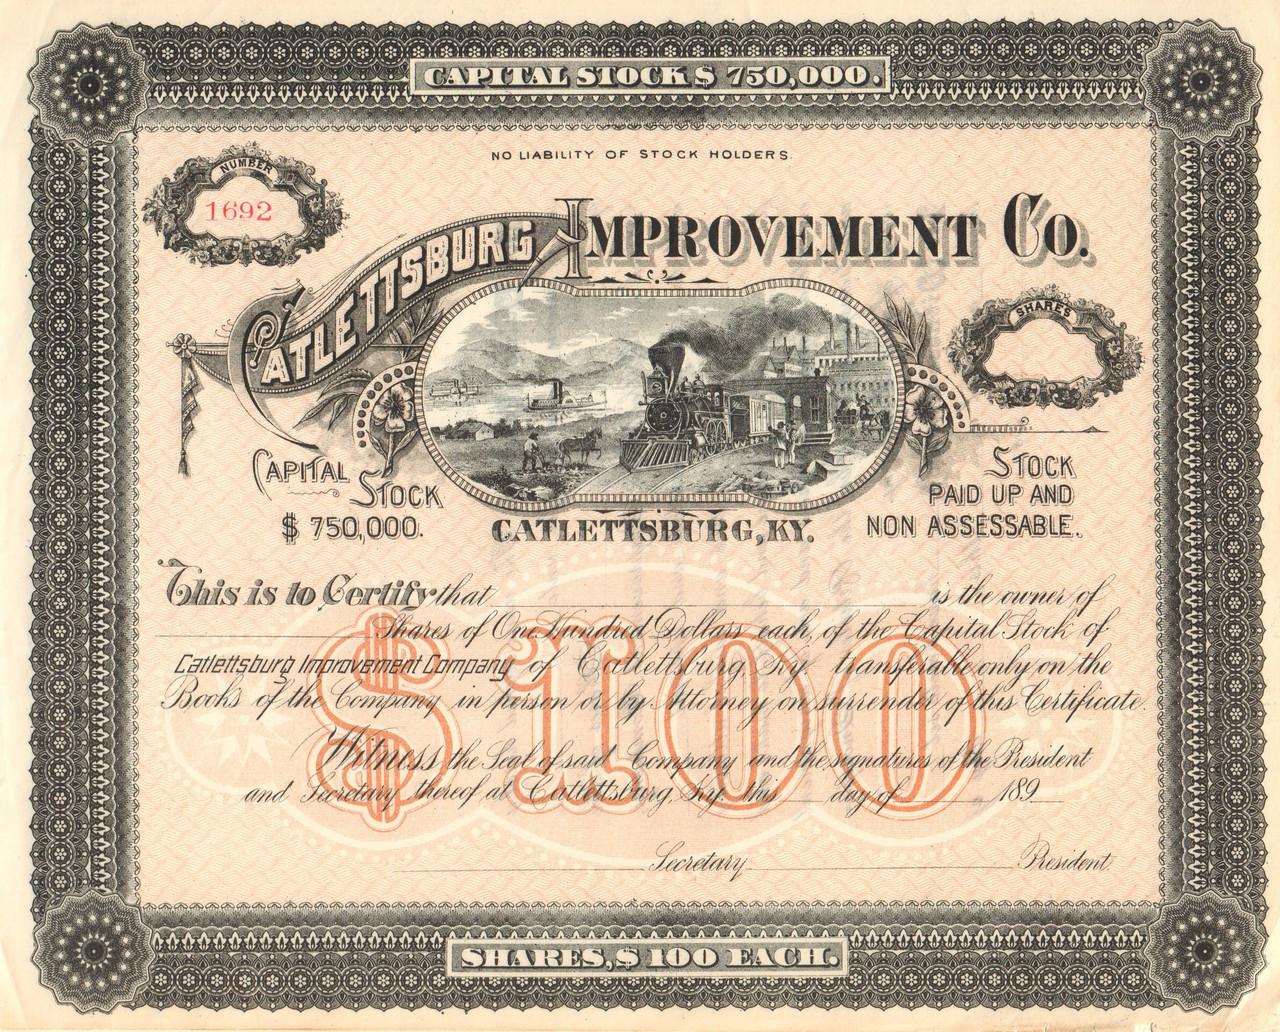 Catlettsburg Improvement Company Stock Certificate 1890s Kentucky